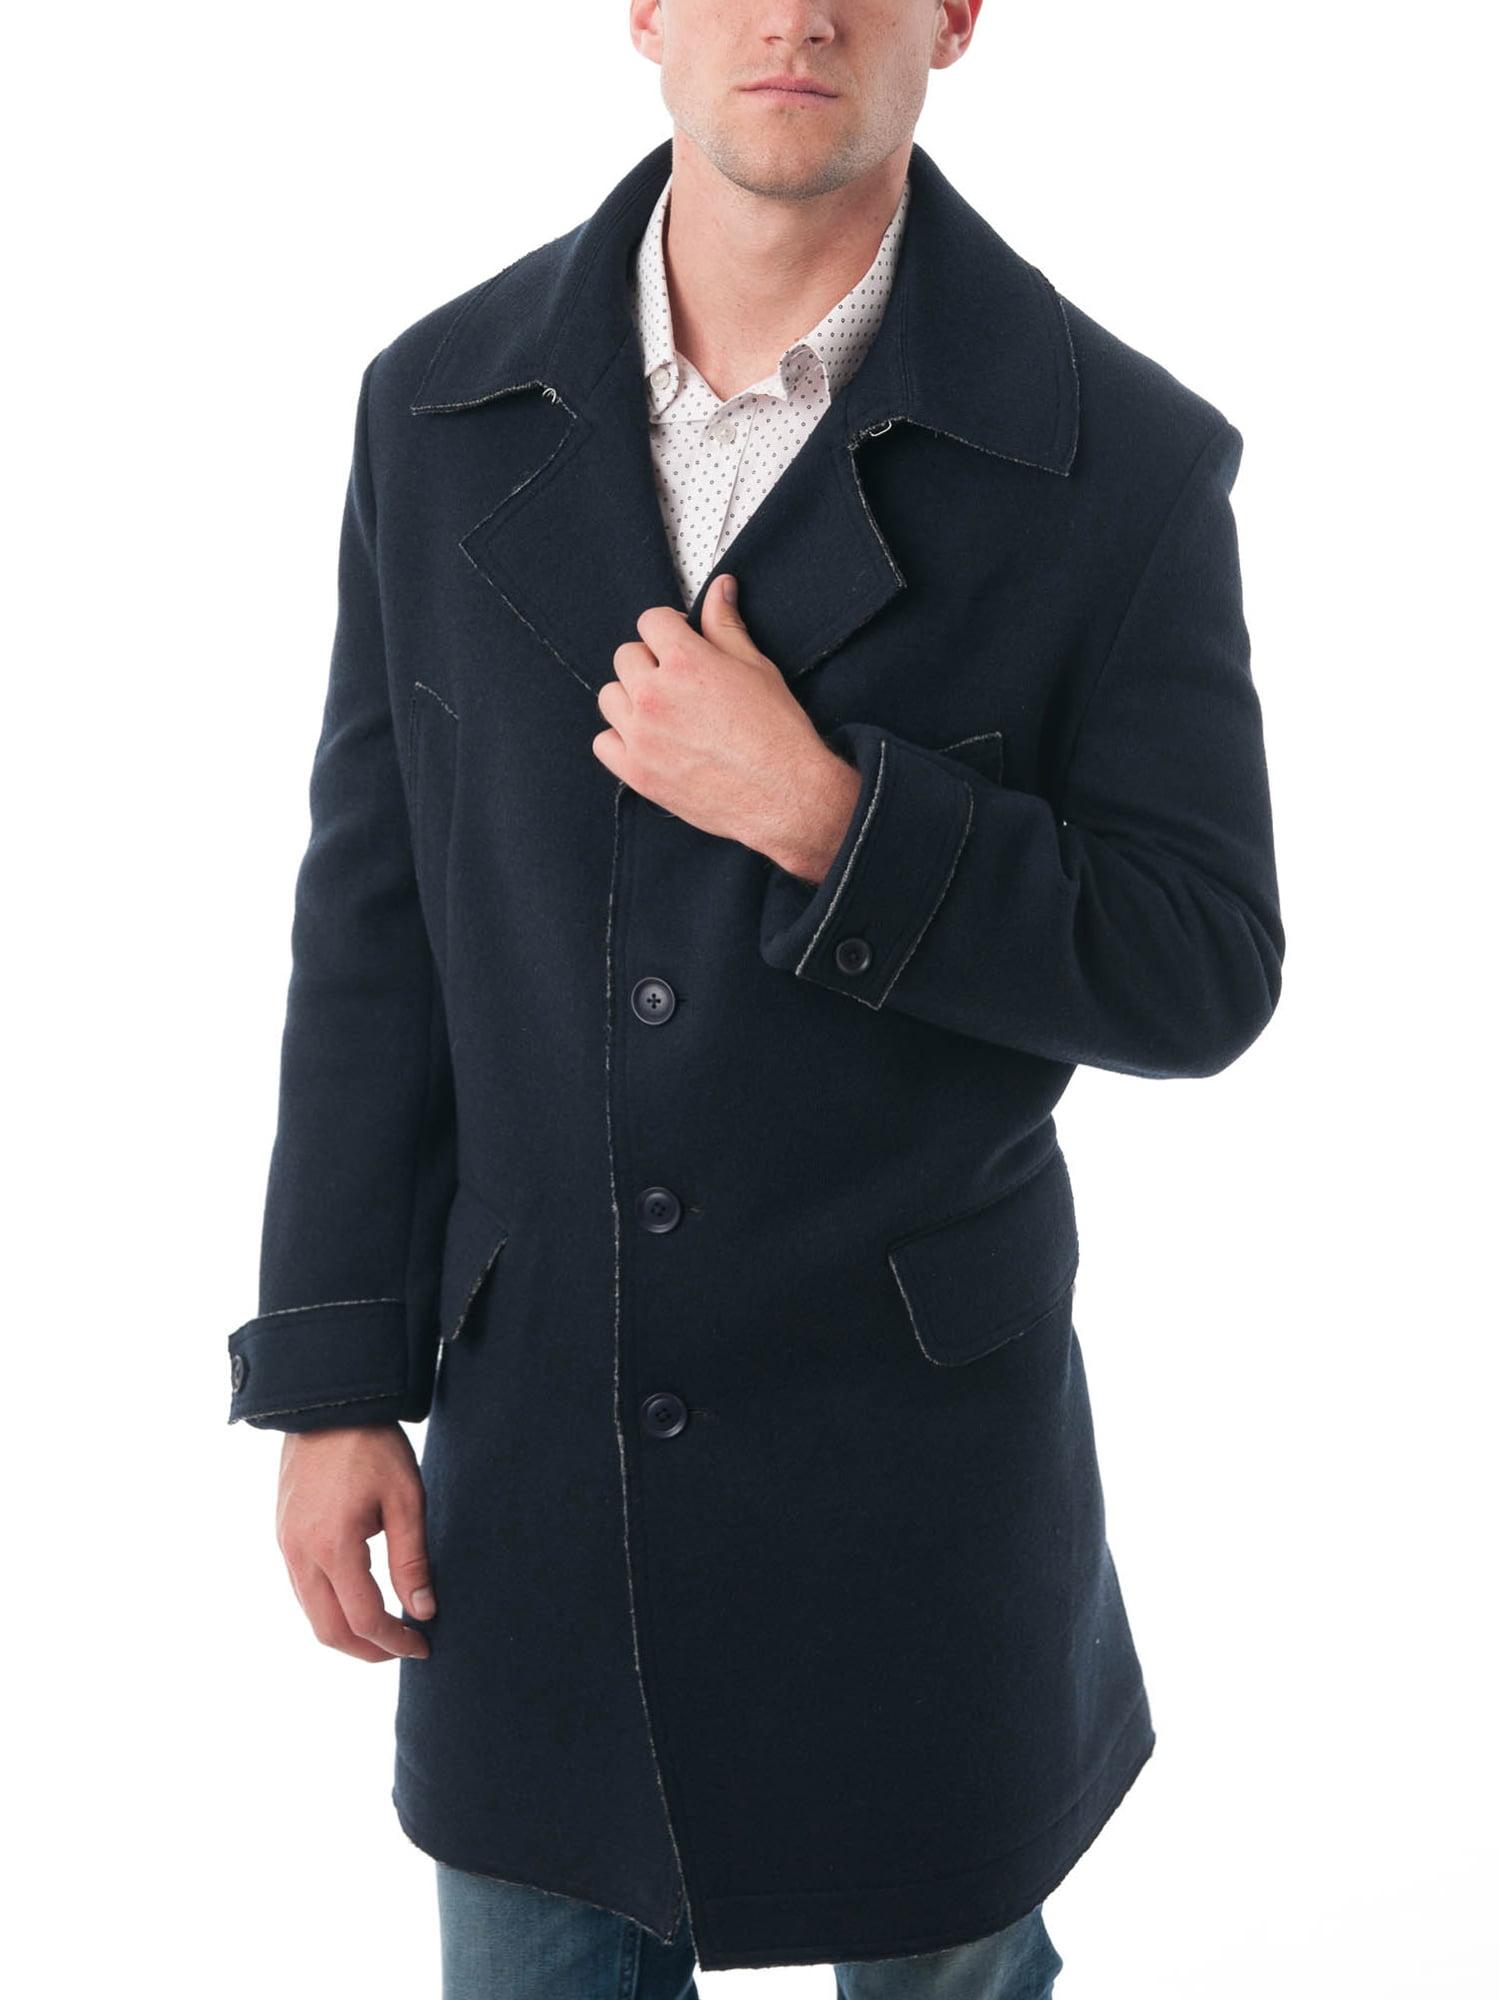 Men's Navy Blue Rough Selvedge Wool Blend Car Coat by Overstock